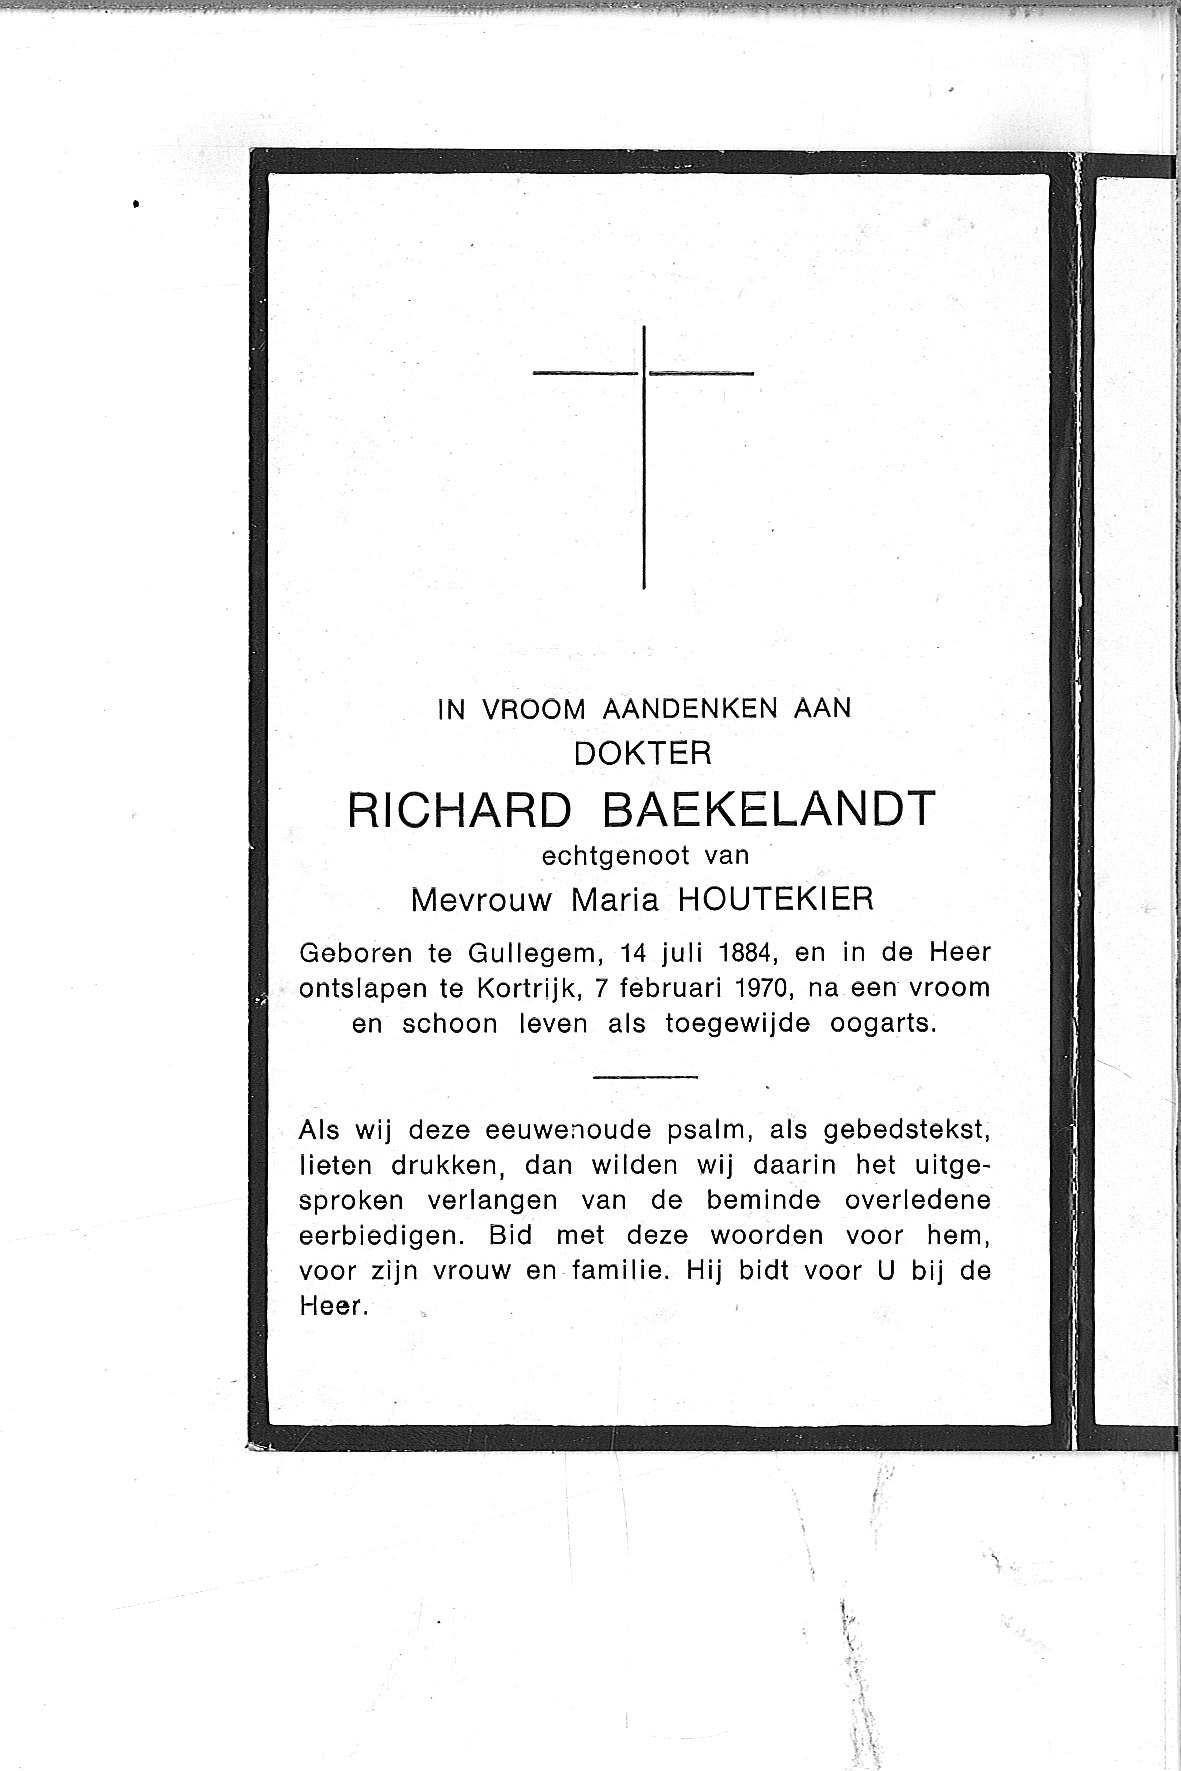 Richard(1970)20130826105243_00079.jpg